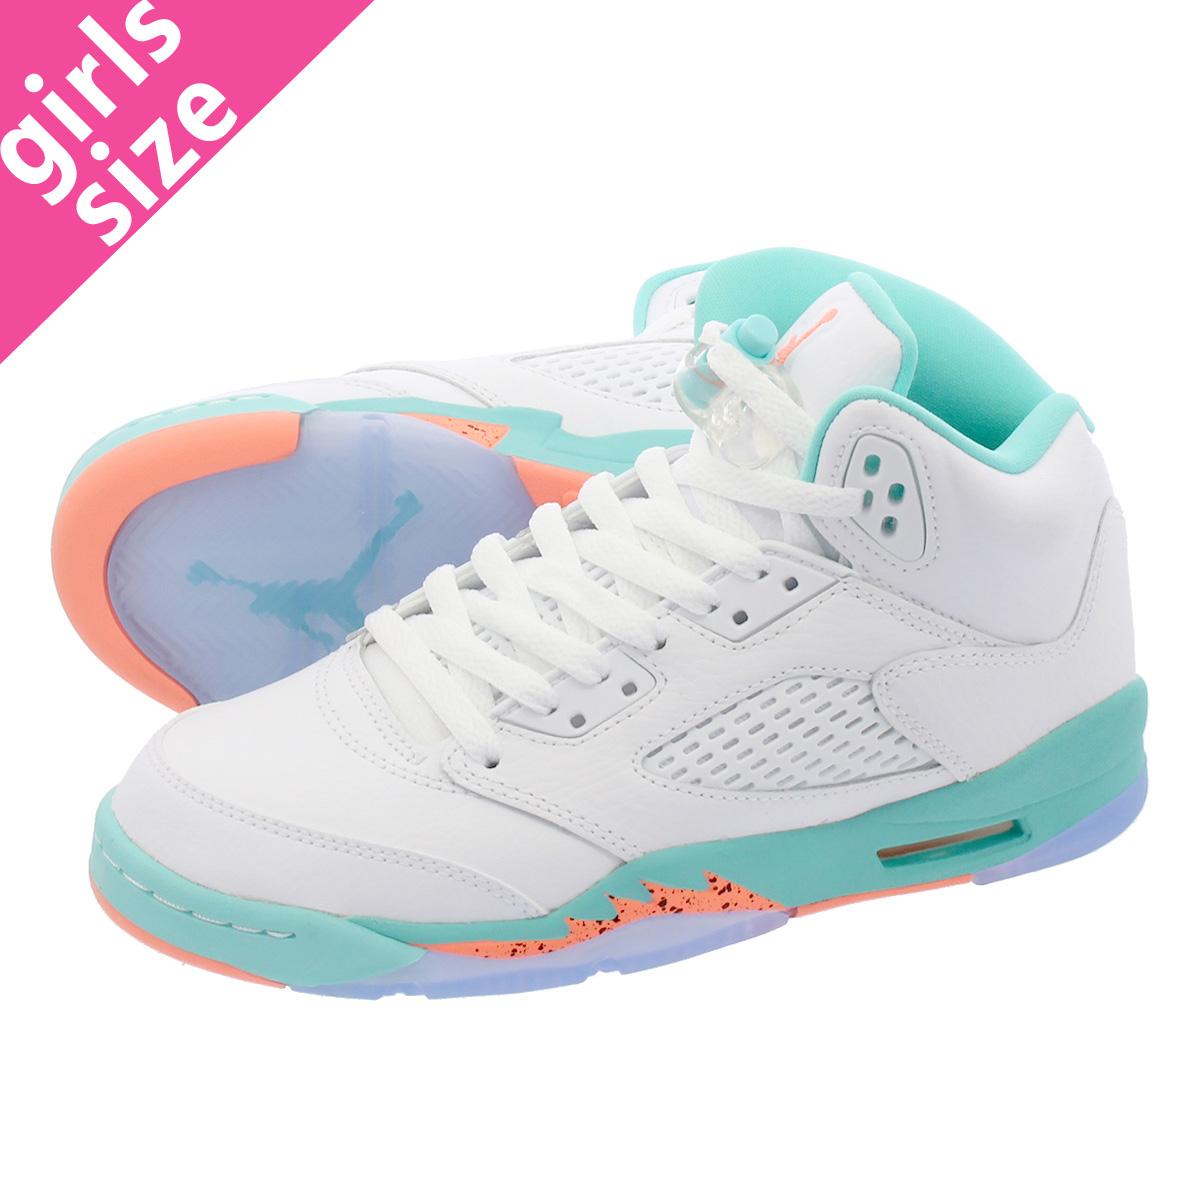 3aa36d7cb1b LOWTEX PLUS  NIKE AIR JORDAN 5 RETRO GG Nike air Jordan 5 nostalgic GG WHITE  CRIMSON PULSE LIGHT AQUA BLACK